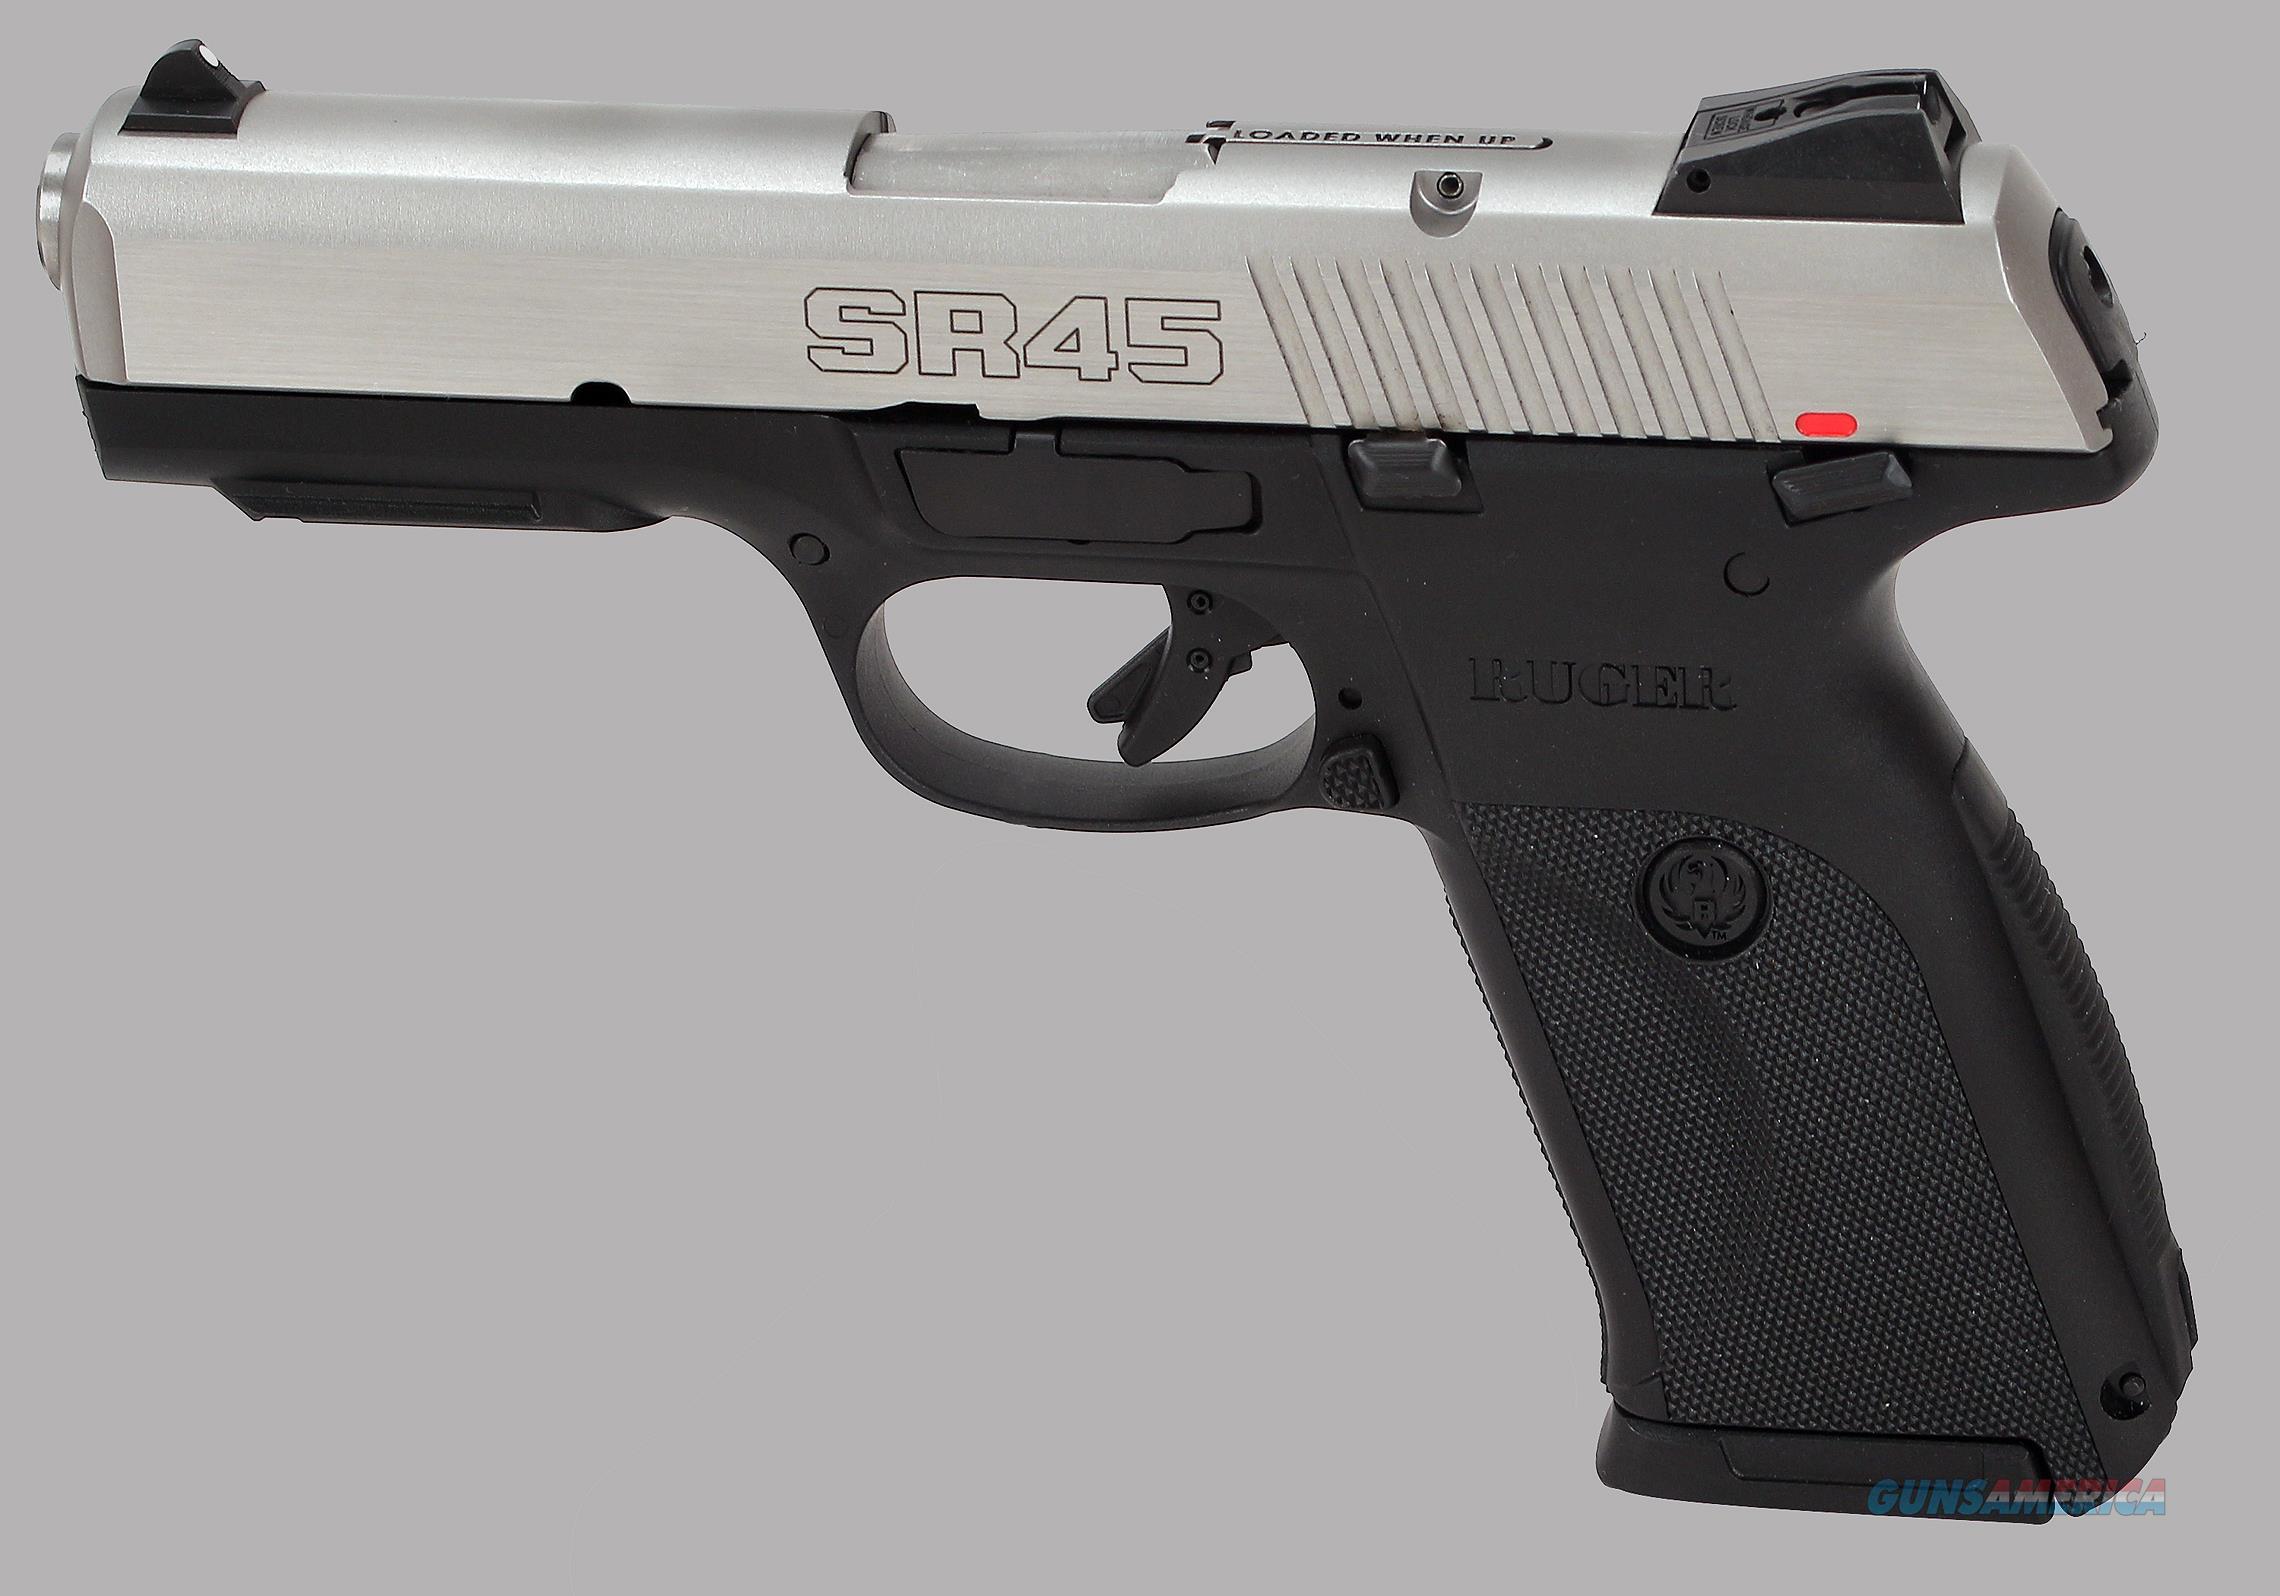 Ruger 45acp SR45 Pistol  Guns > Pistols > Ruger Semi-Auto Pistols > SR Family > SR45